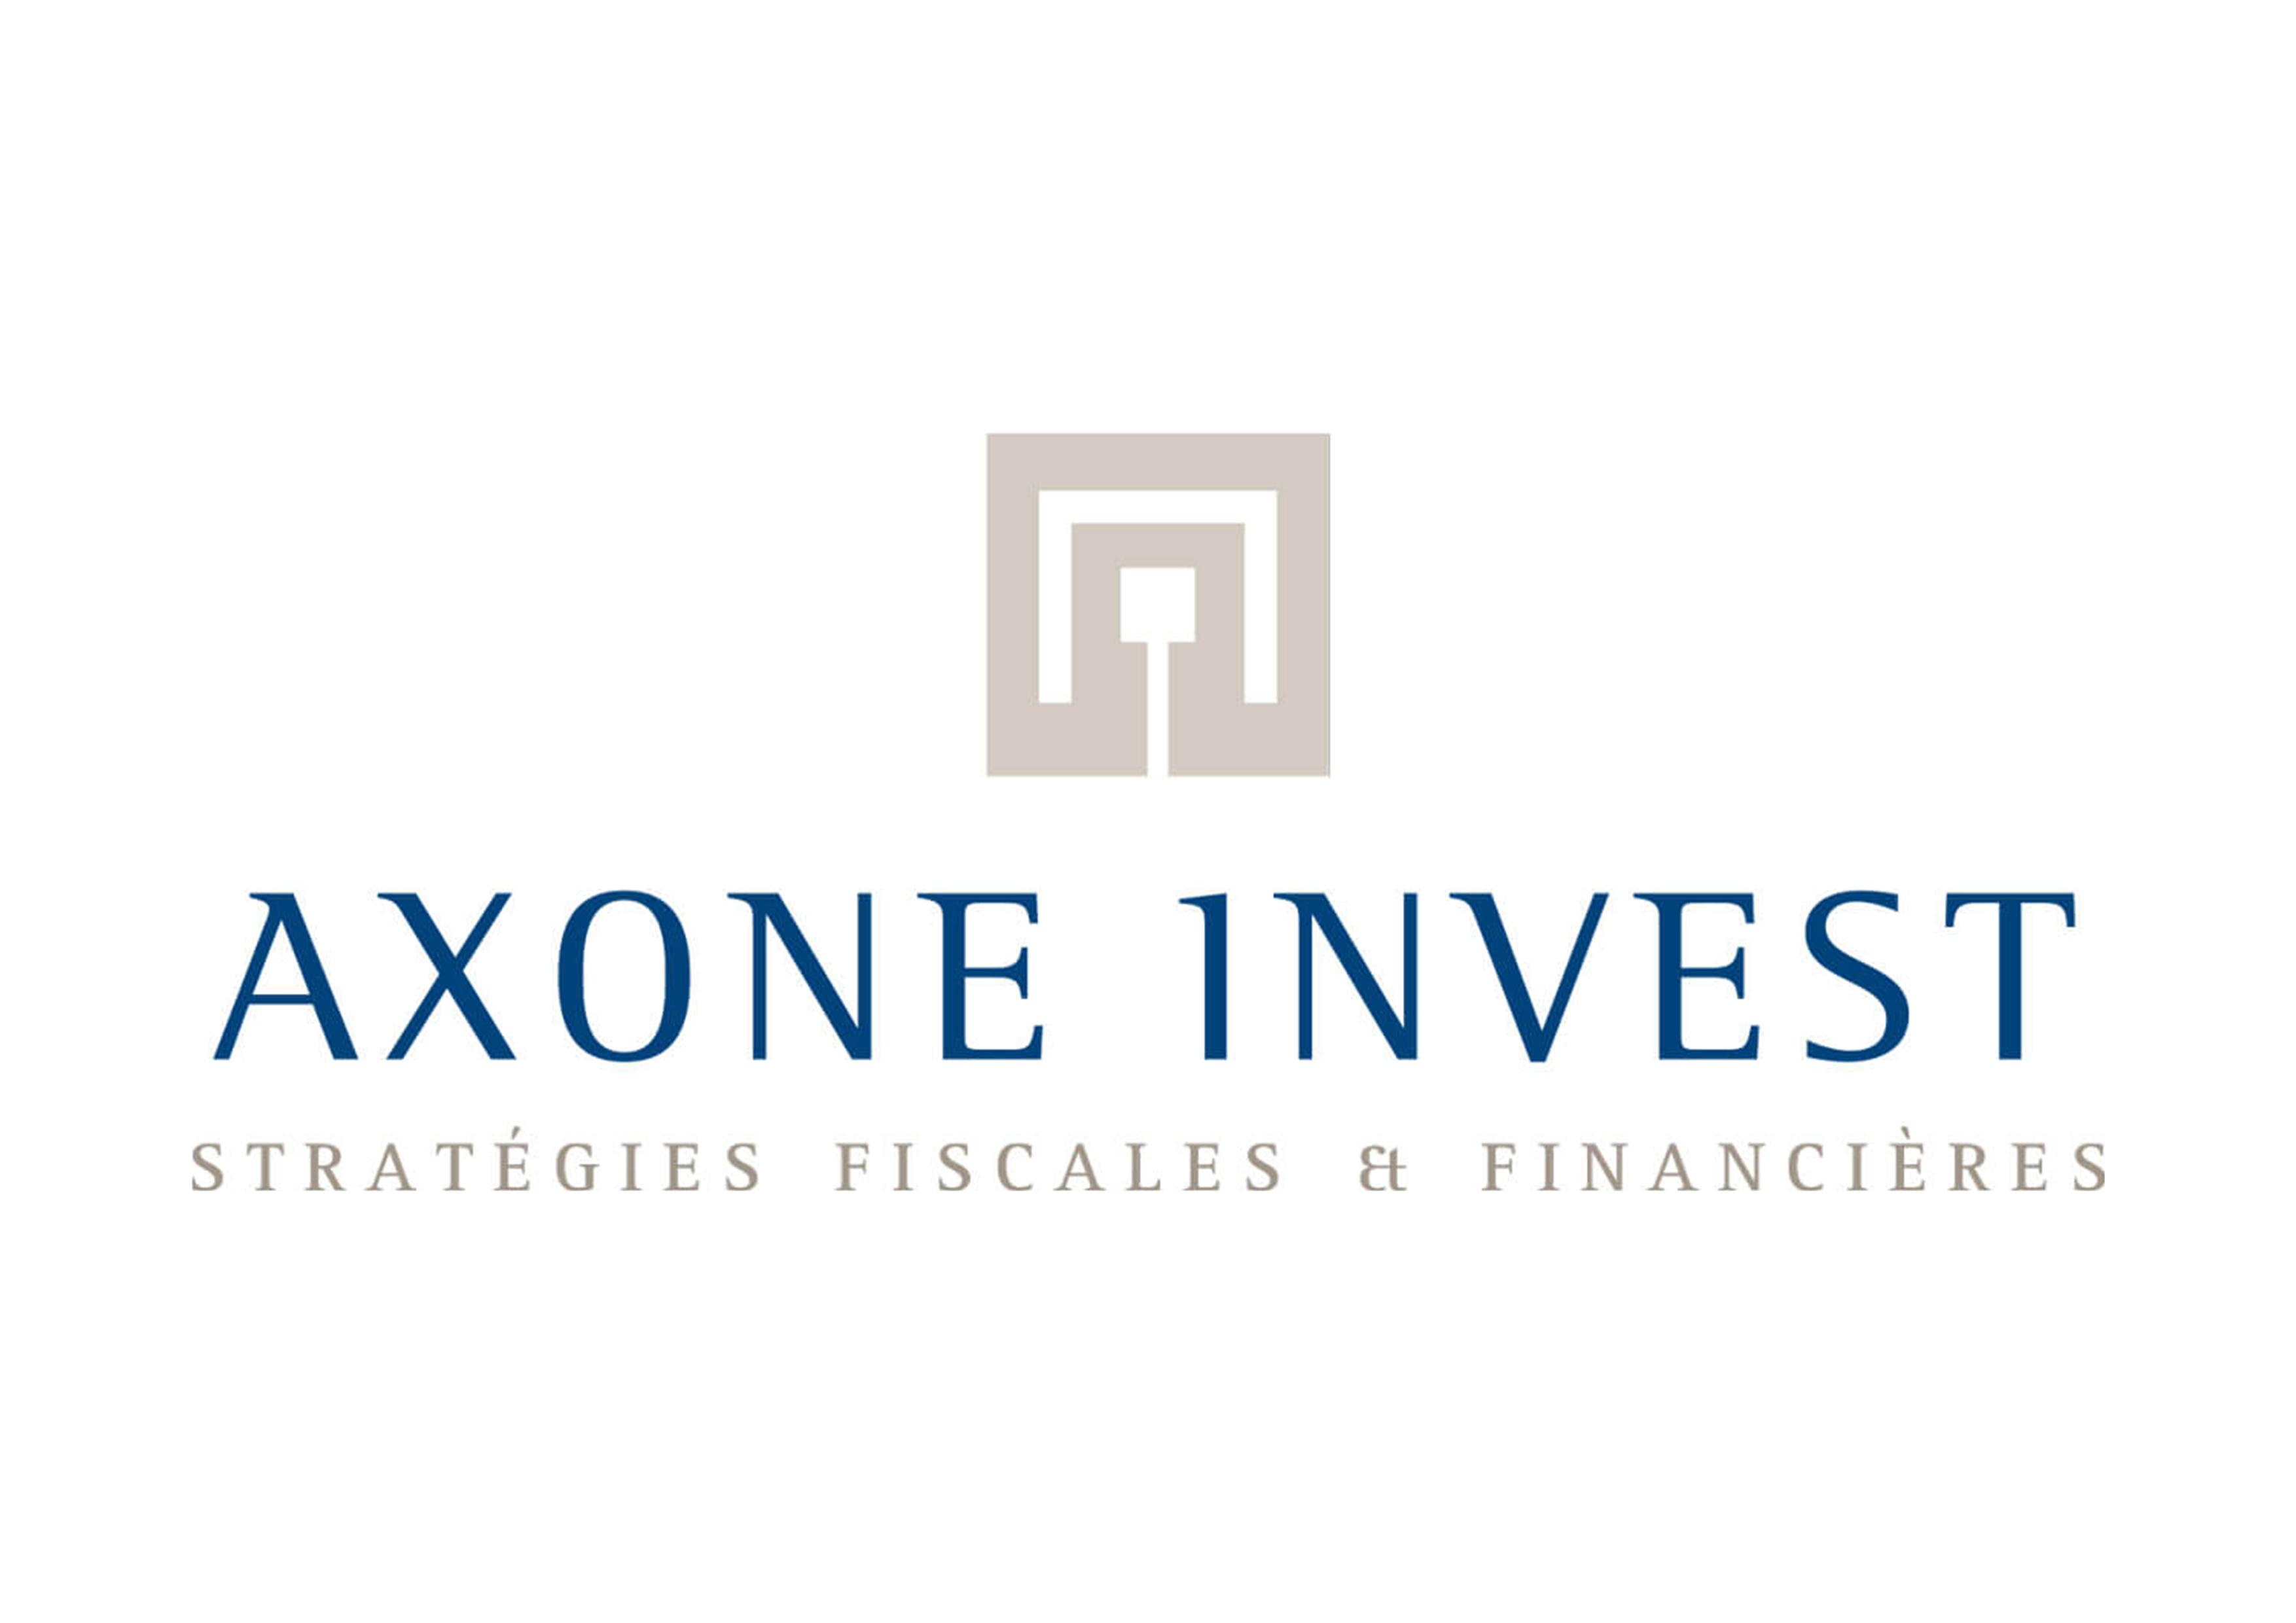 Axone Invest